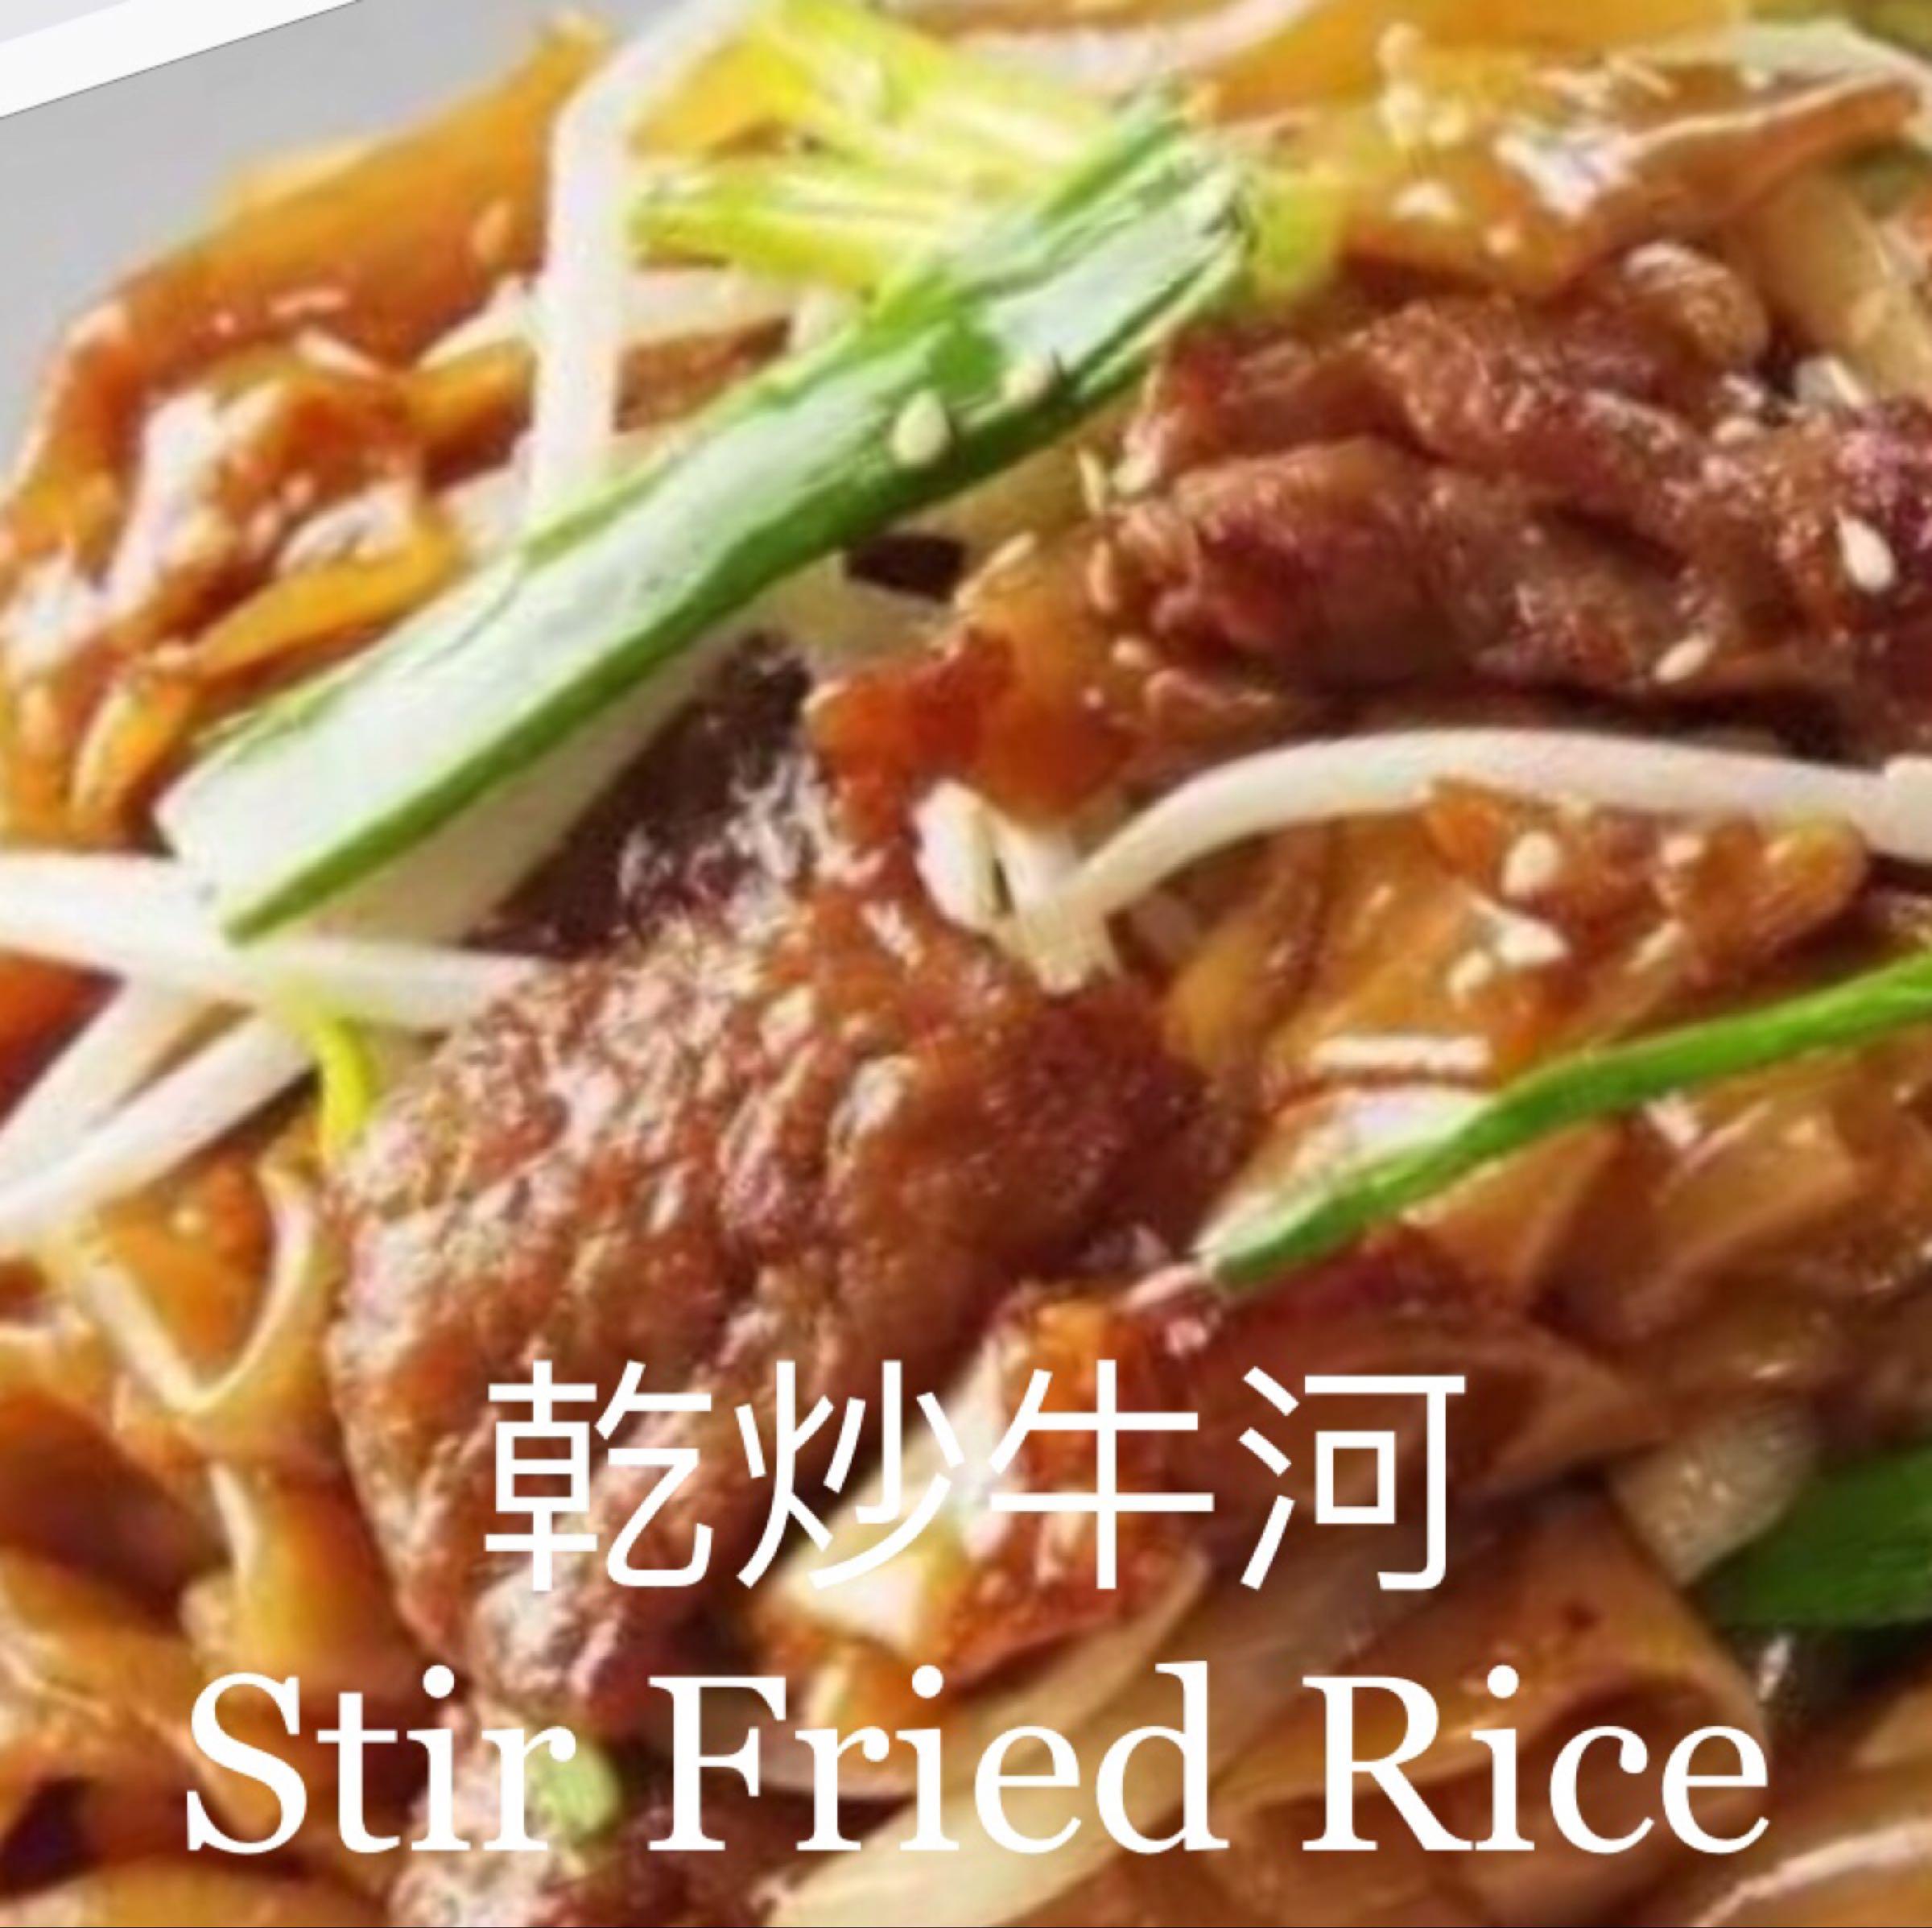 乾炒牛河 Stir Fried Rice Noodle w Beef